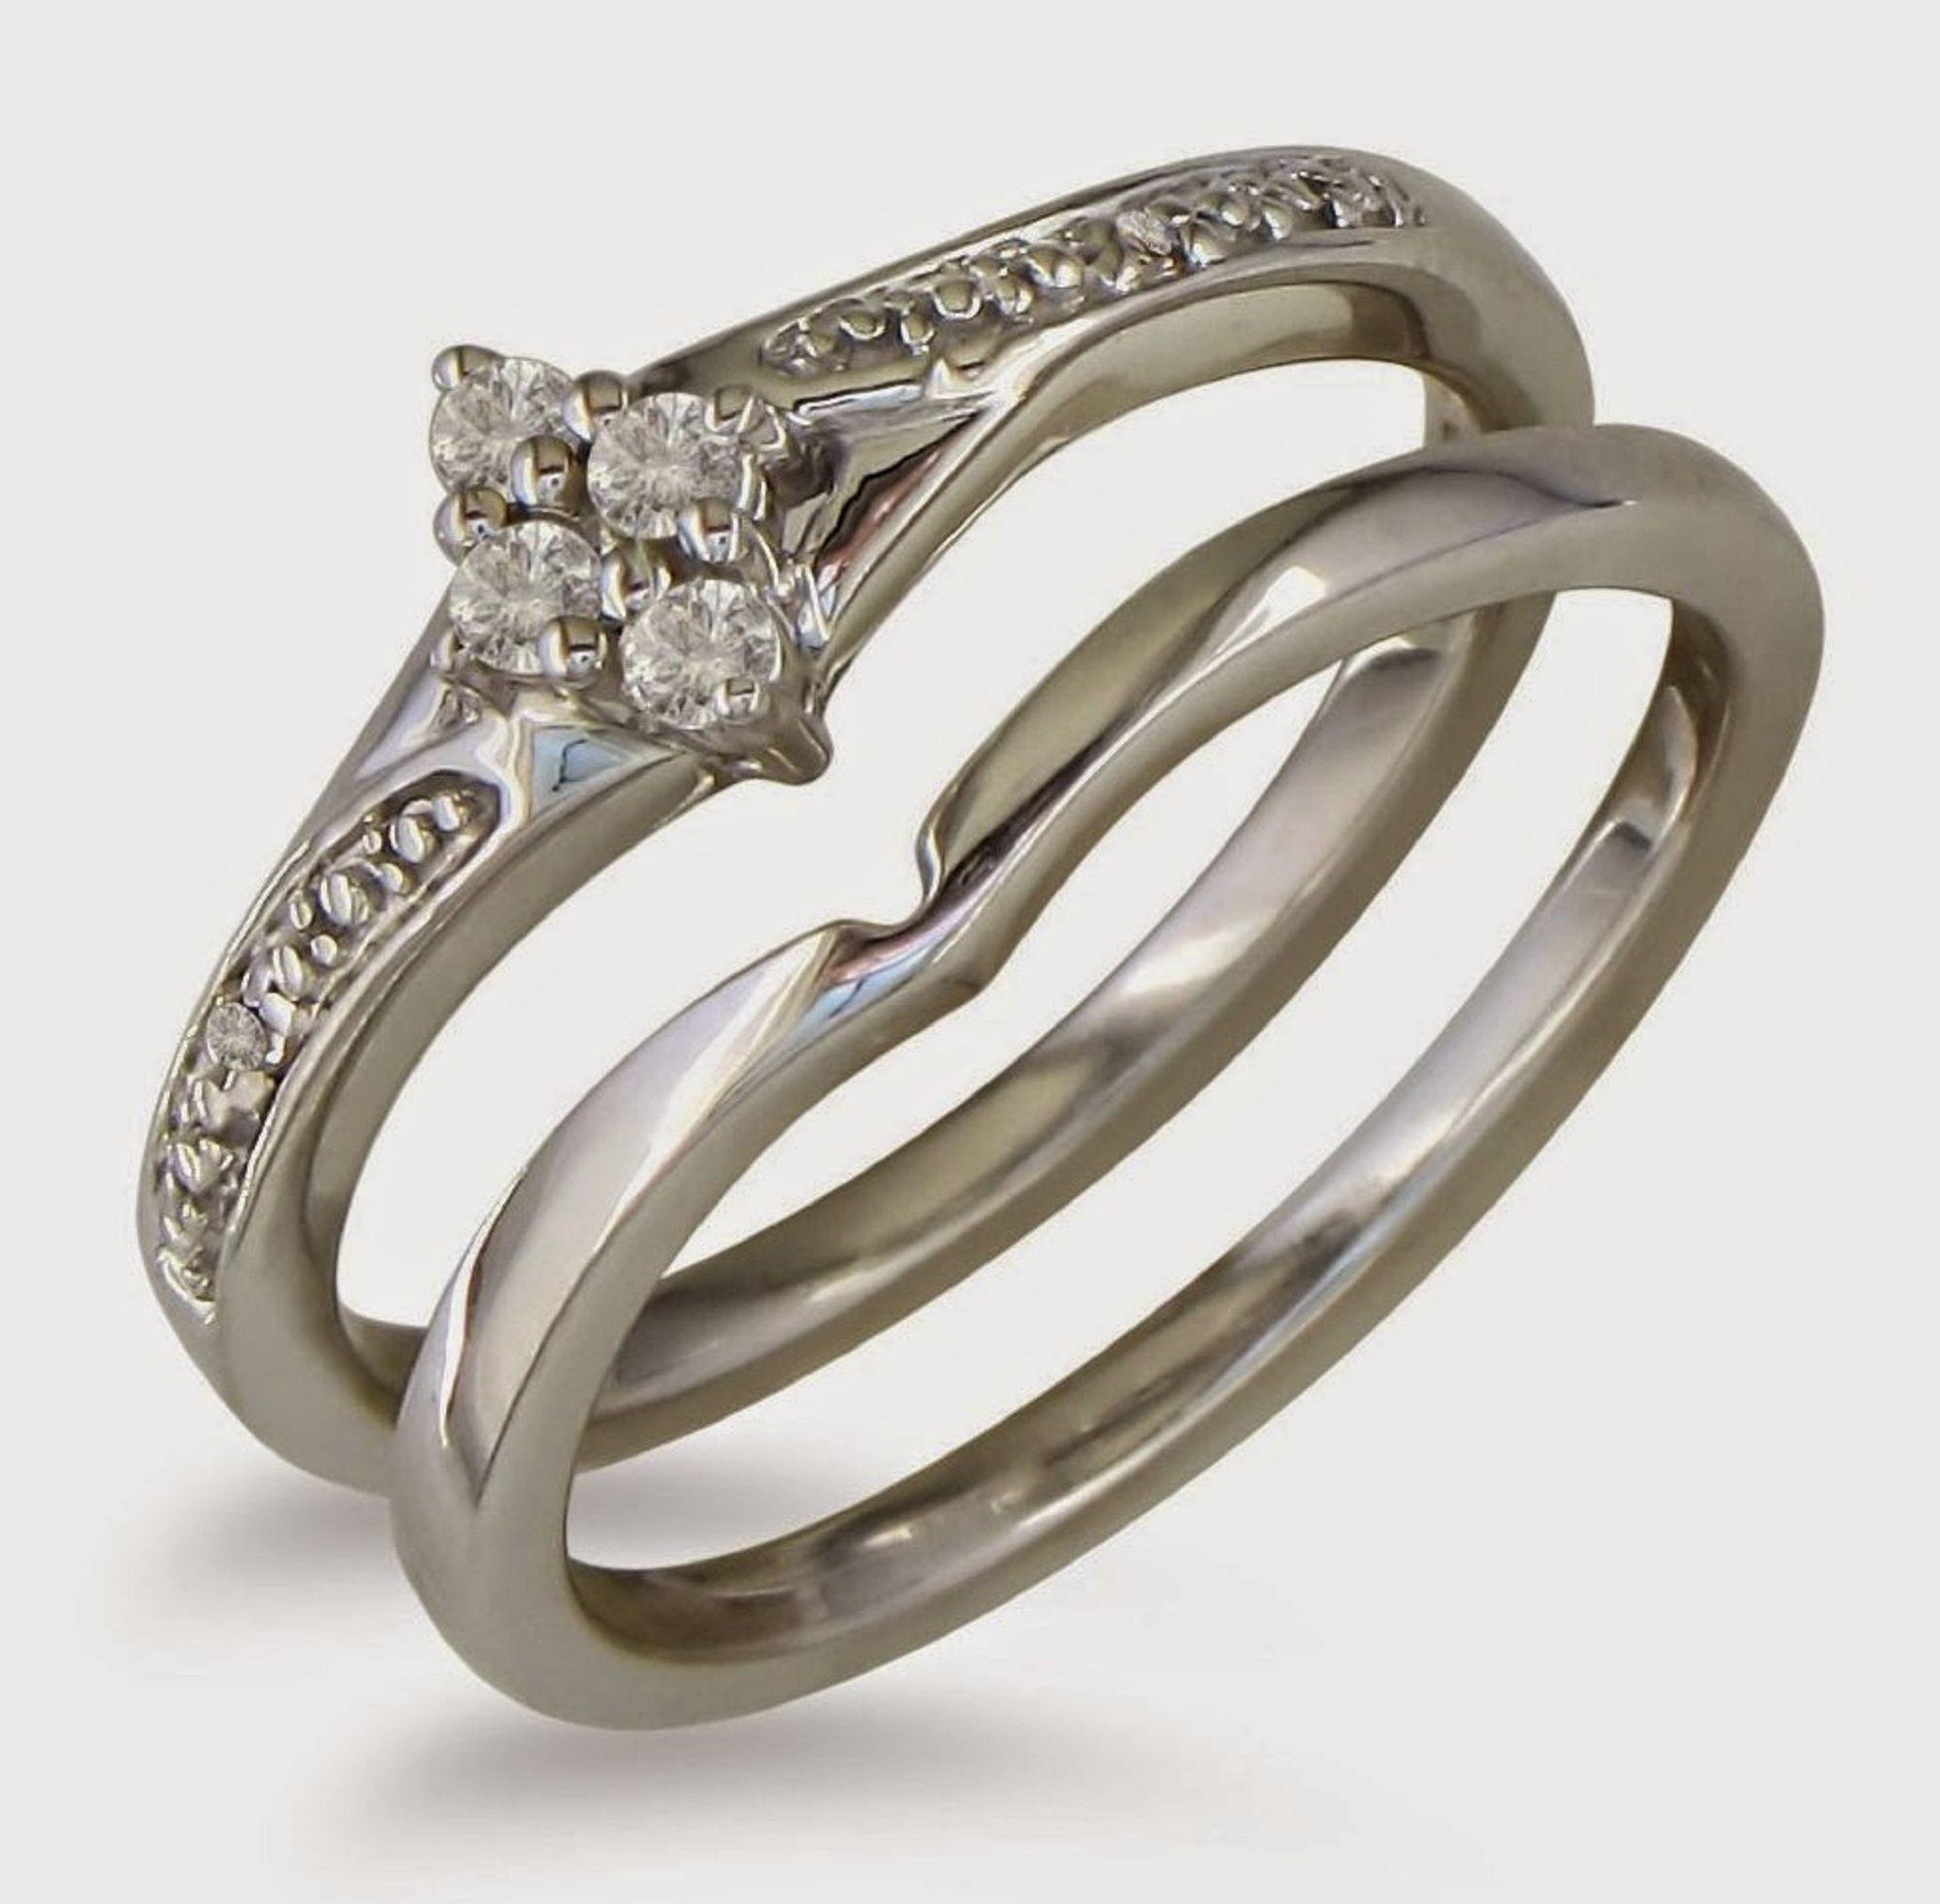 wedding ring designs for groom Wedding ring shopping